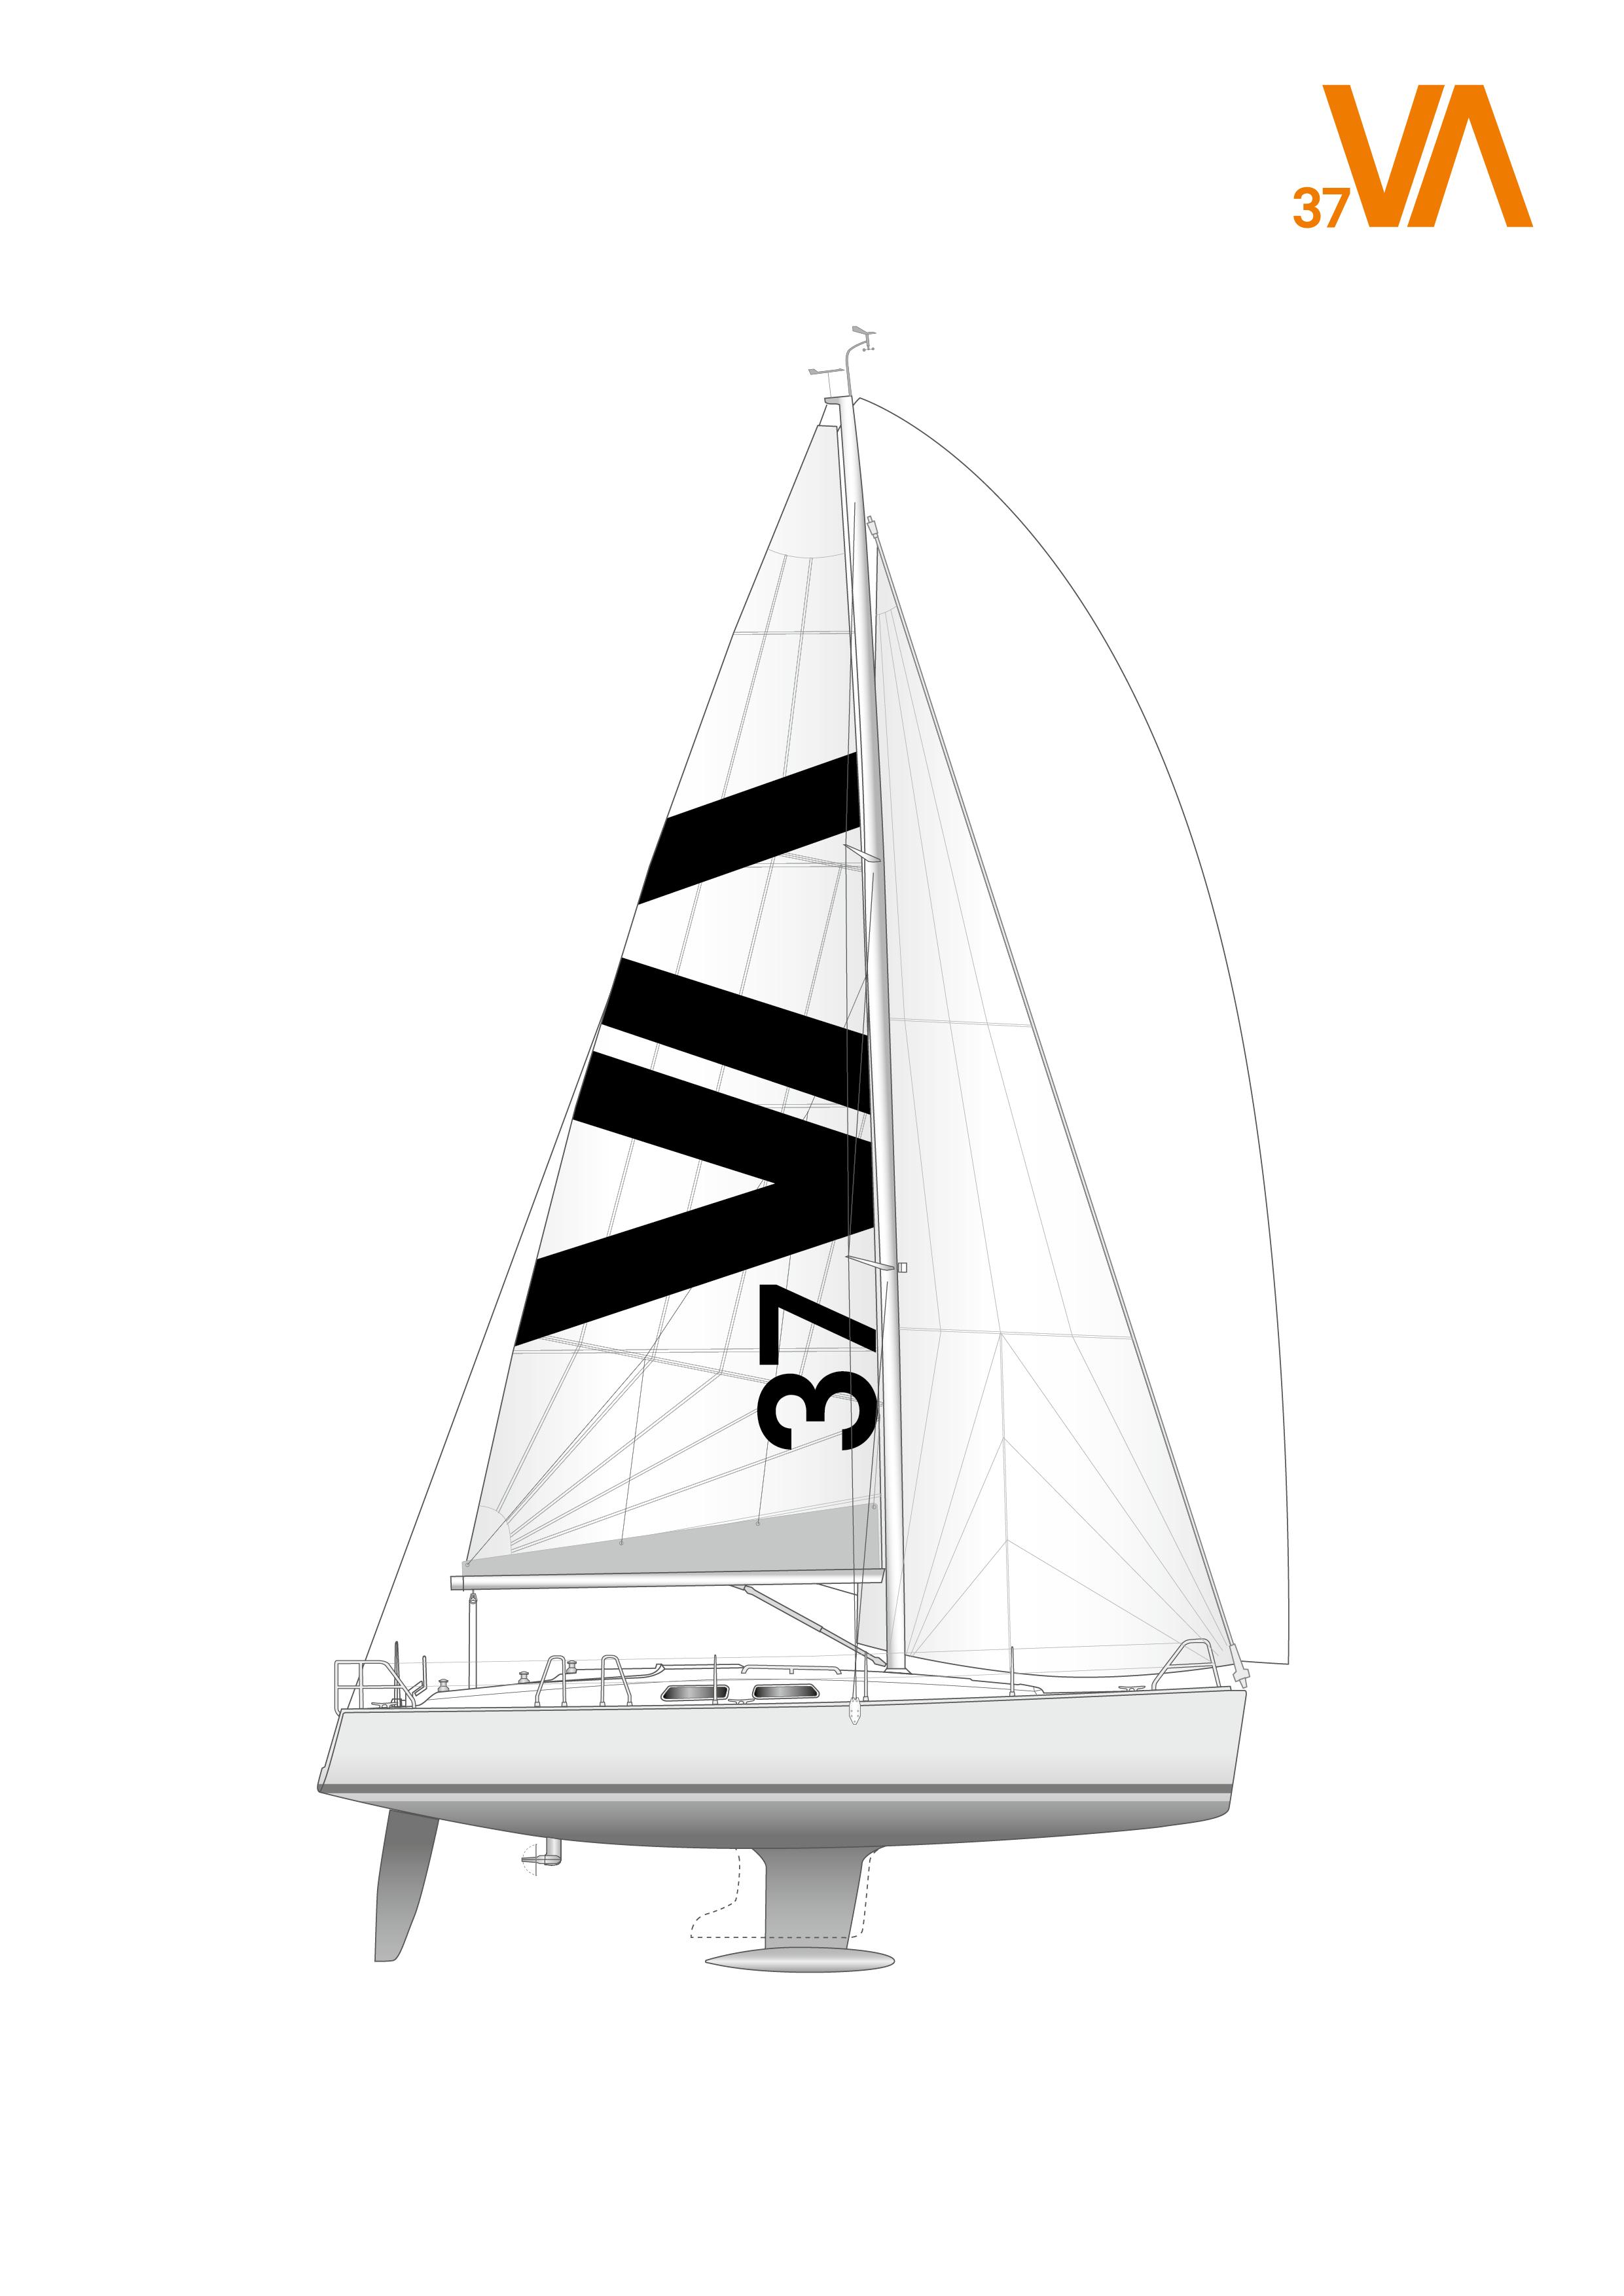 Varianta  - Varianta_37_Segelplan_4_high-a65cc.jpg